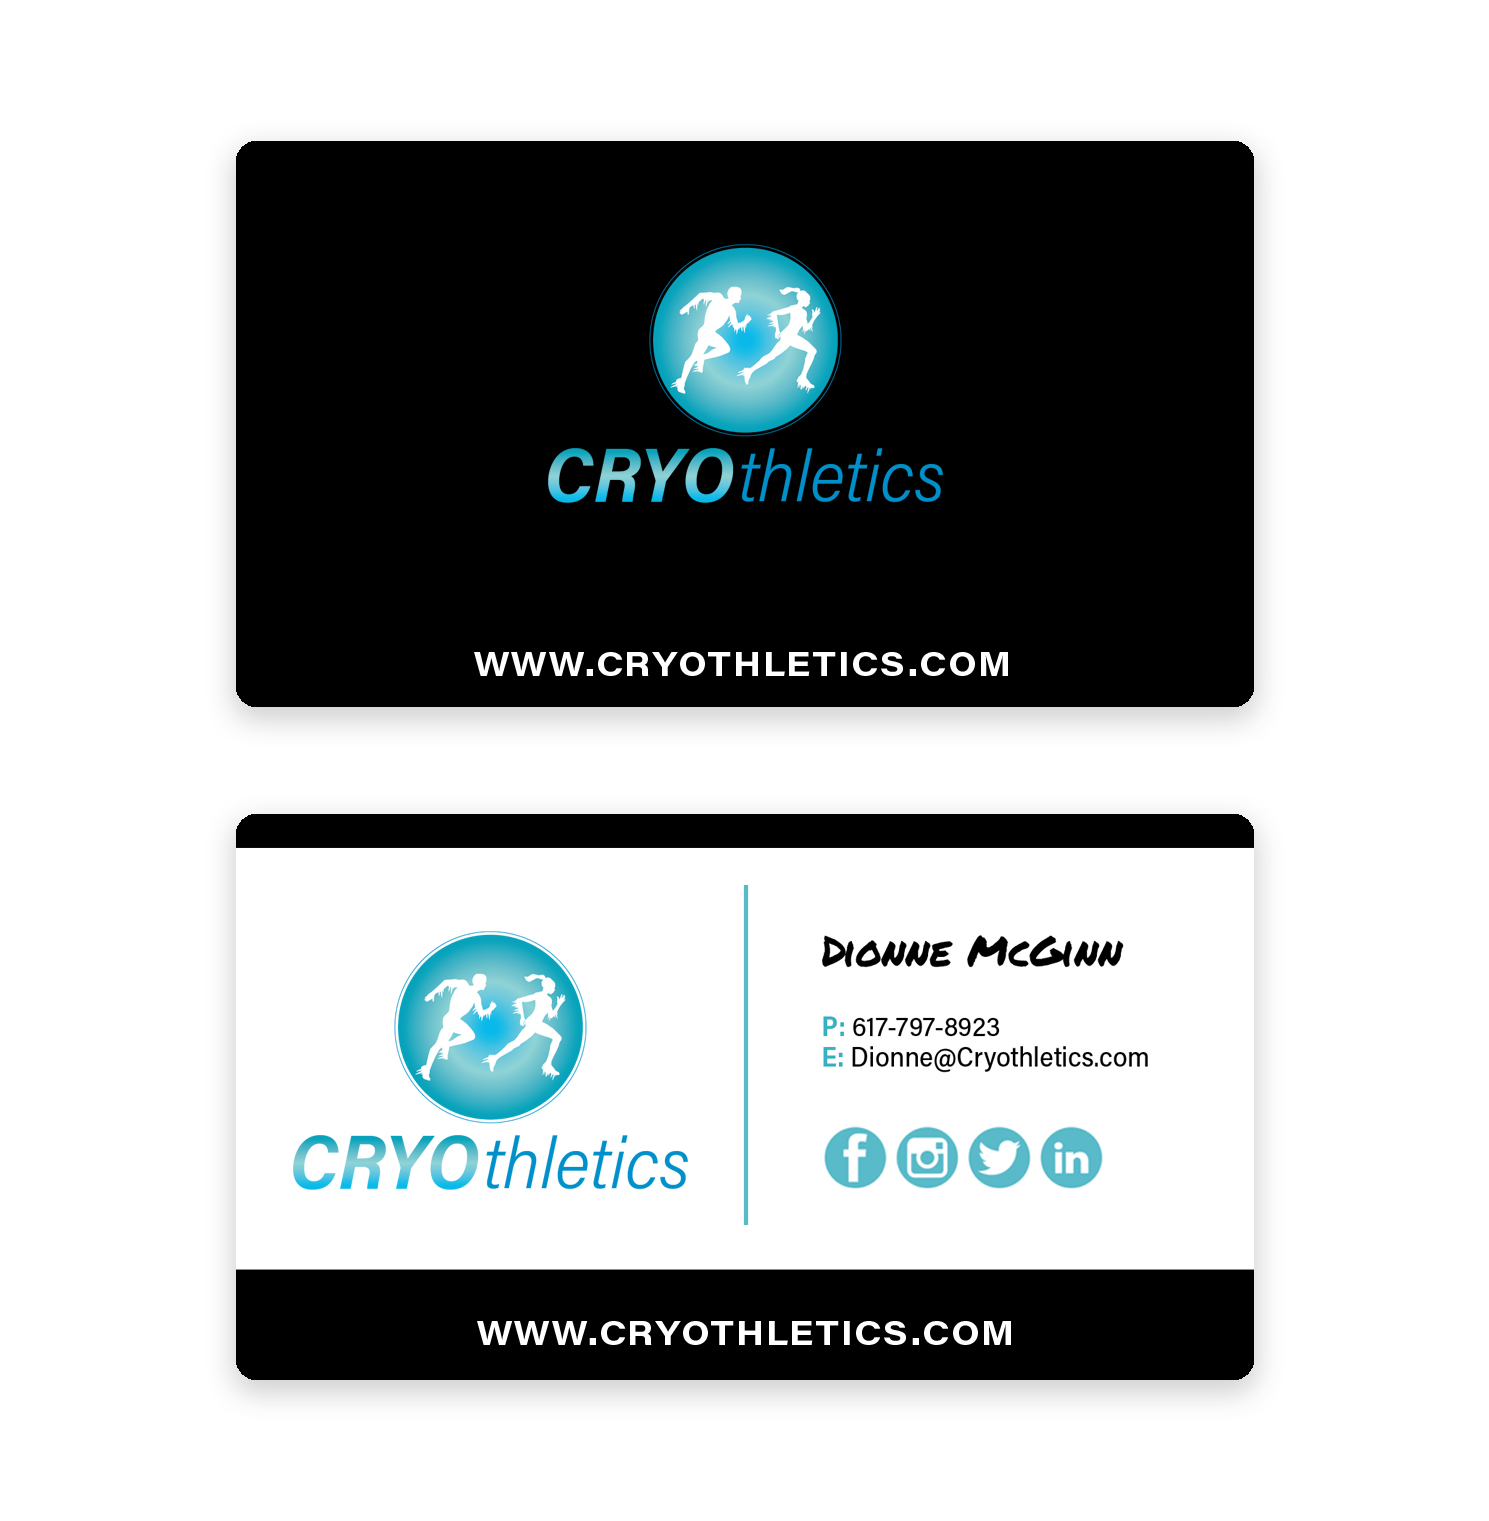 cryo business card FINAL PROOF-2.jpg